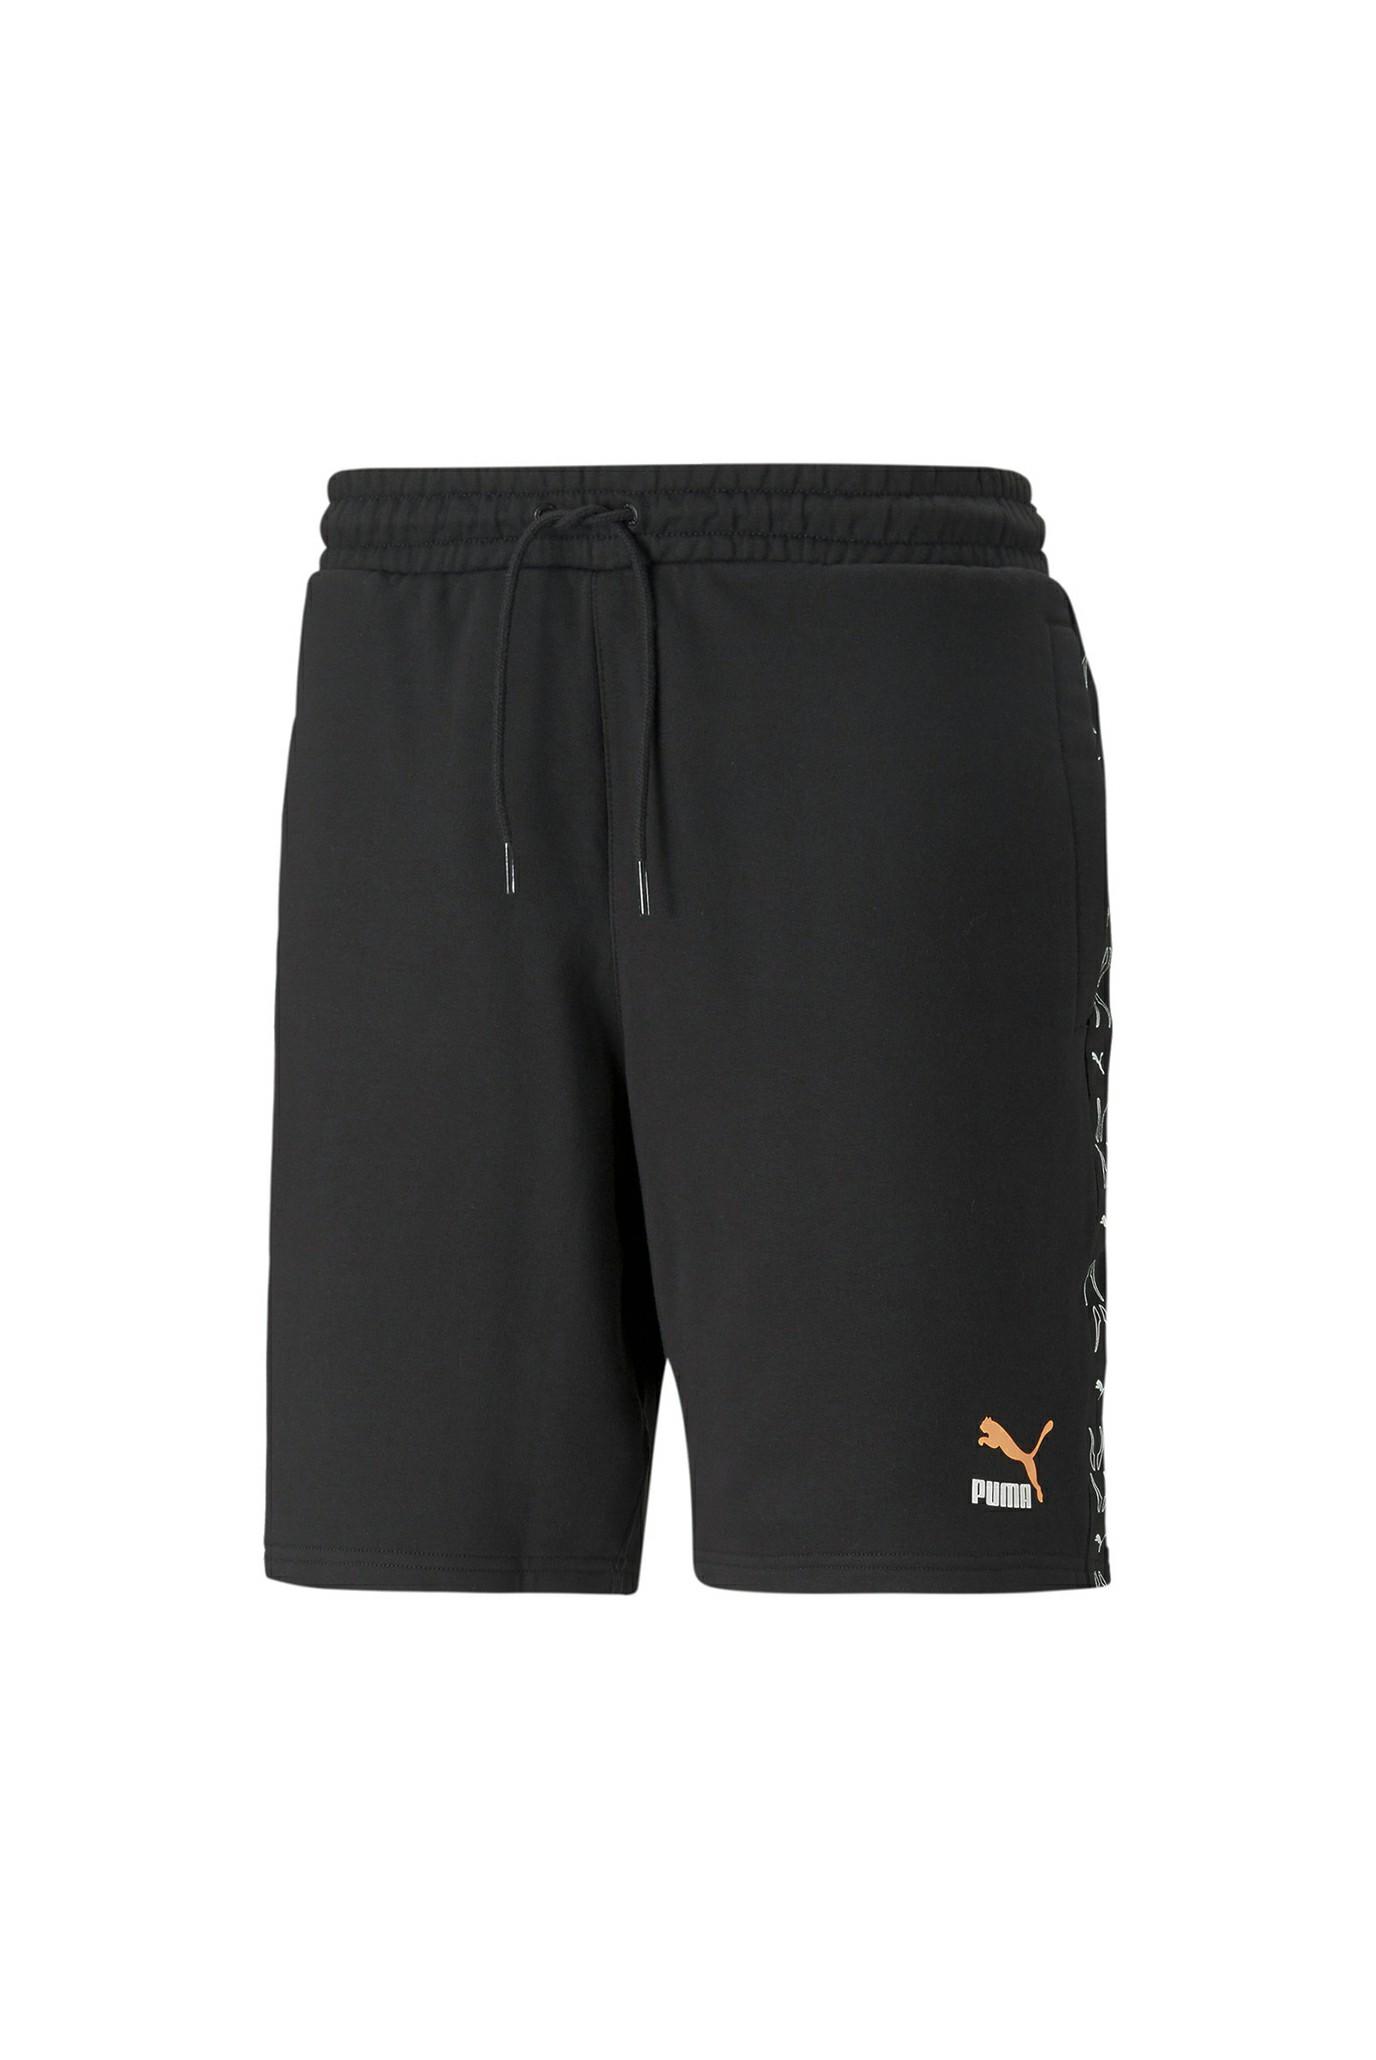 Шорты Elevate 8′′ Men's Shorts 1